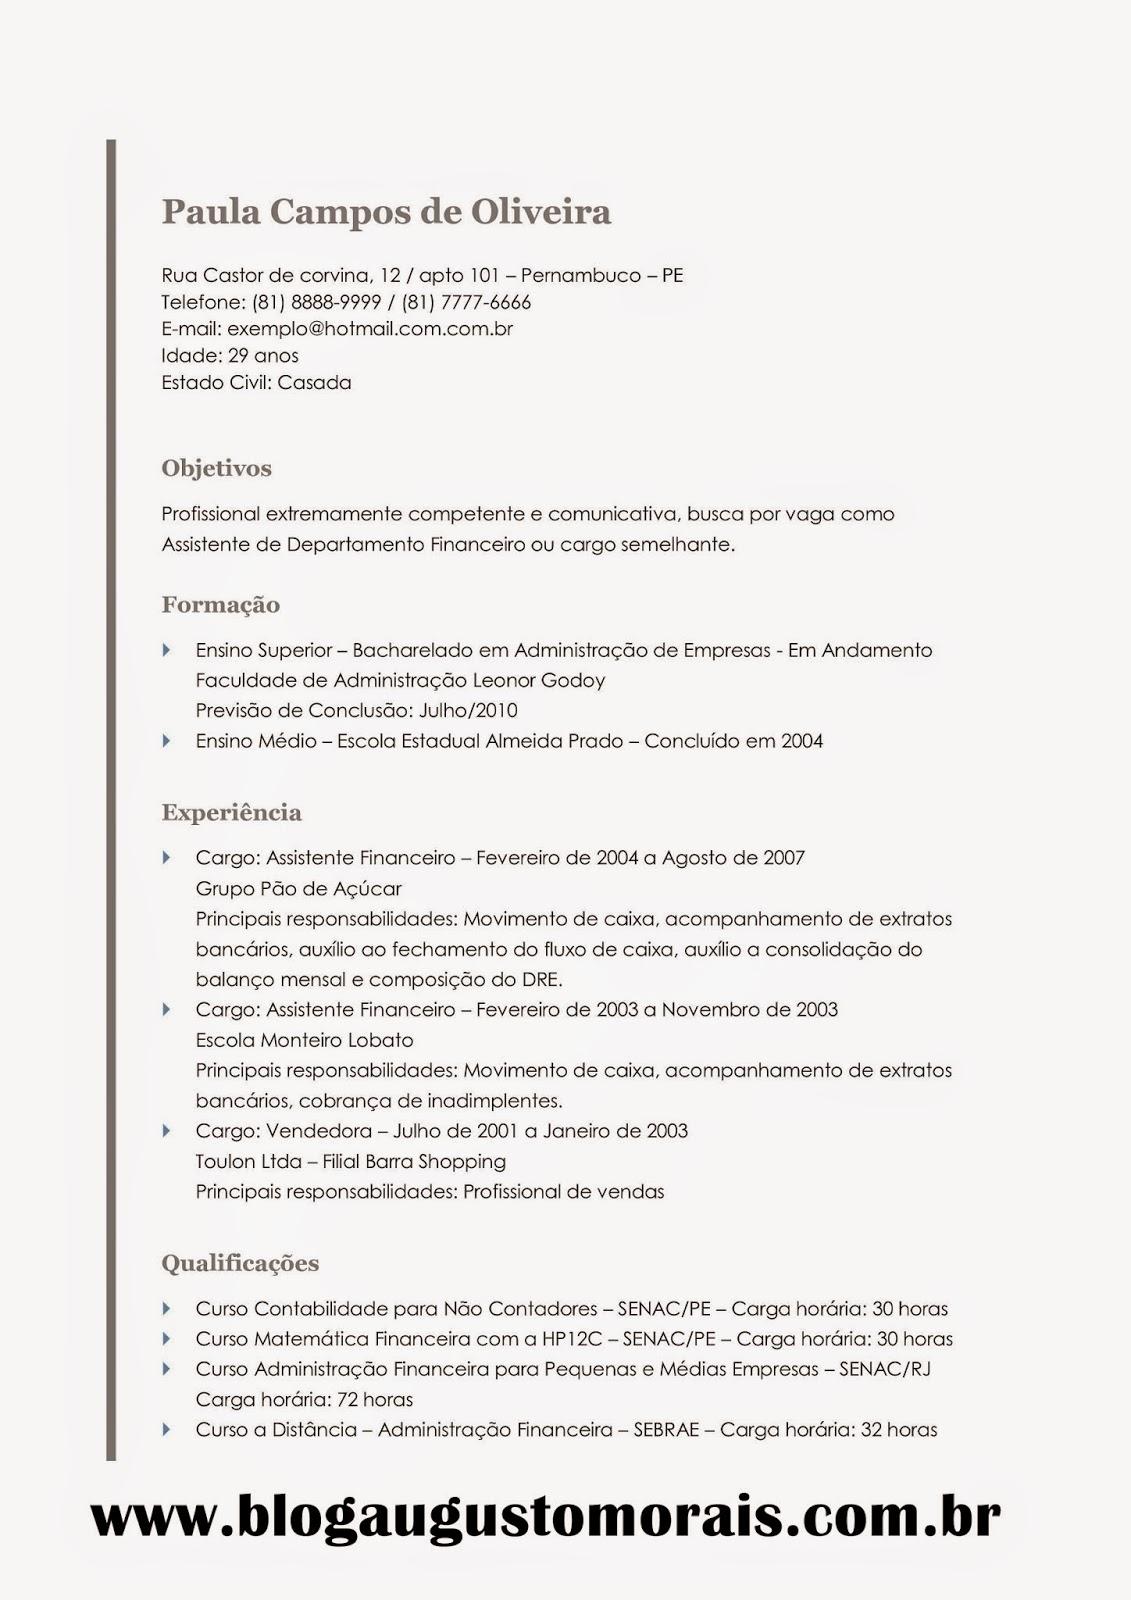 Modelos De Currículo Profissional Grátis Blog Augusto